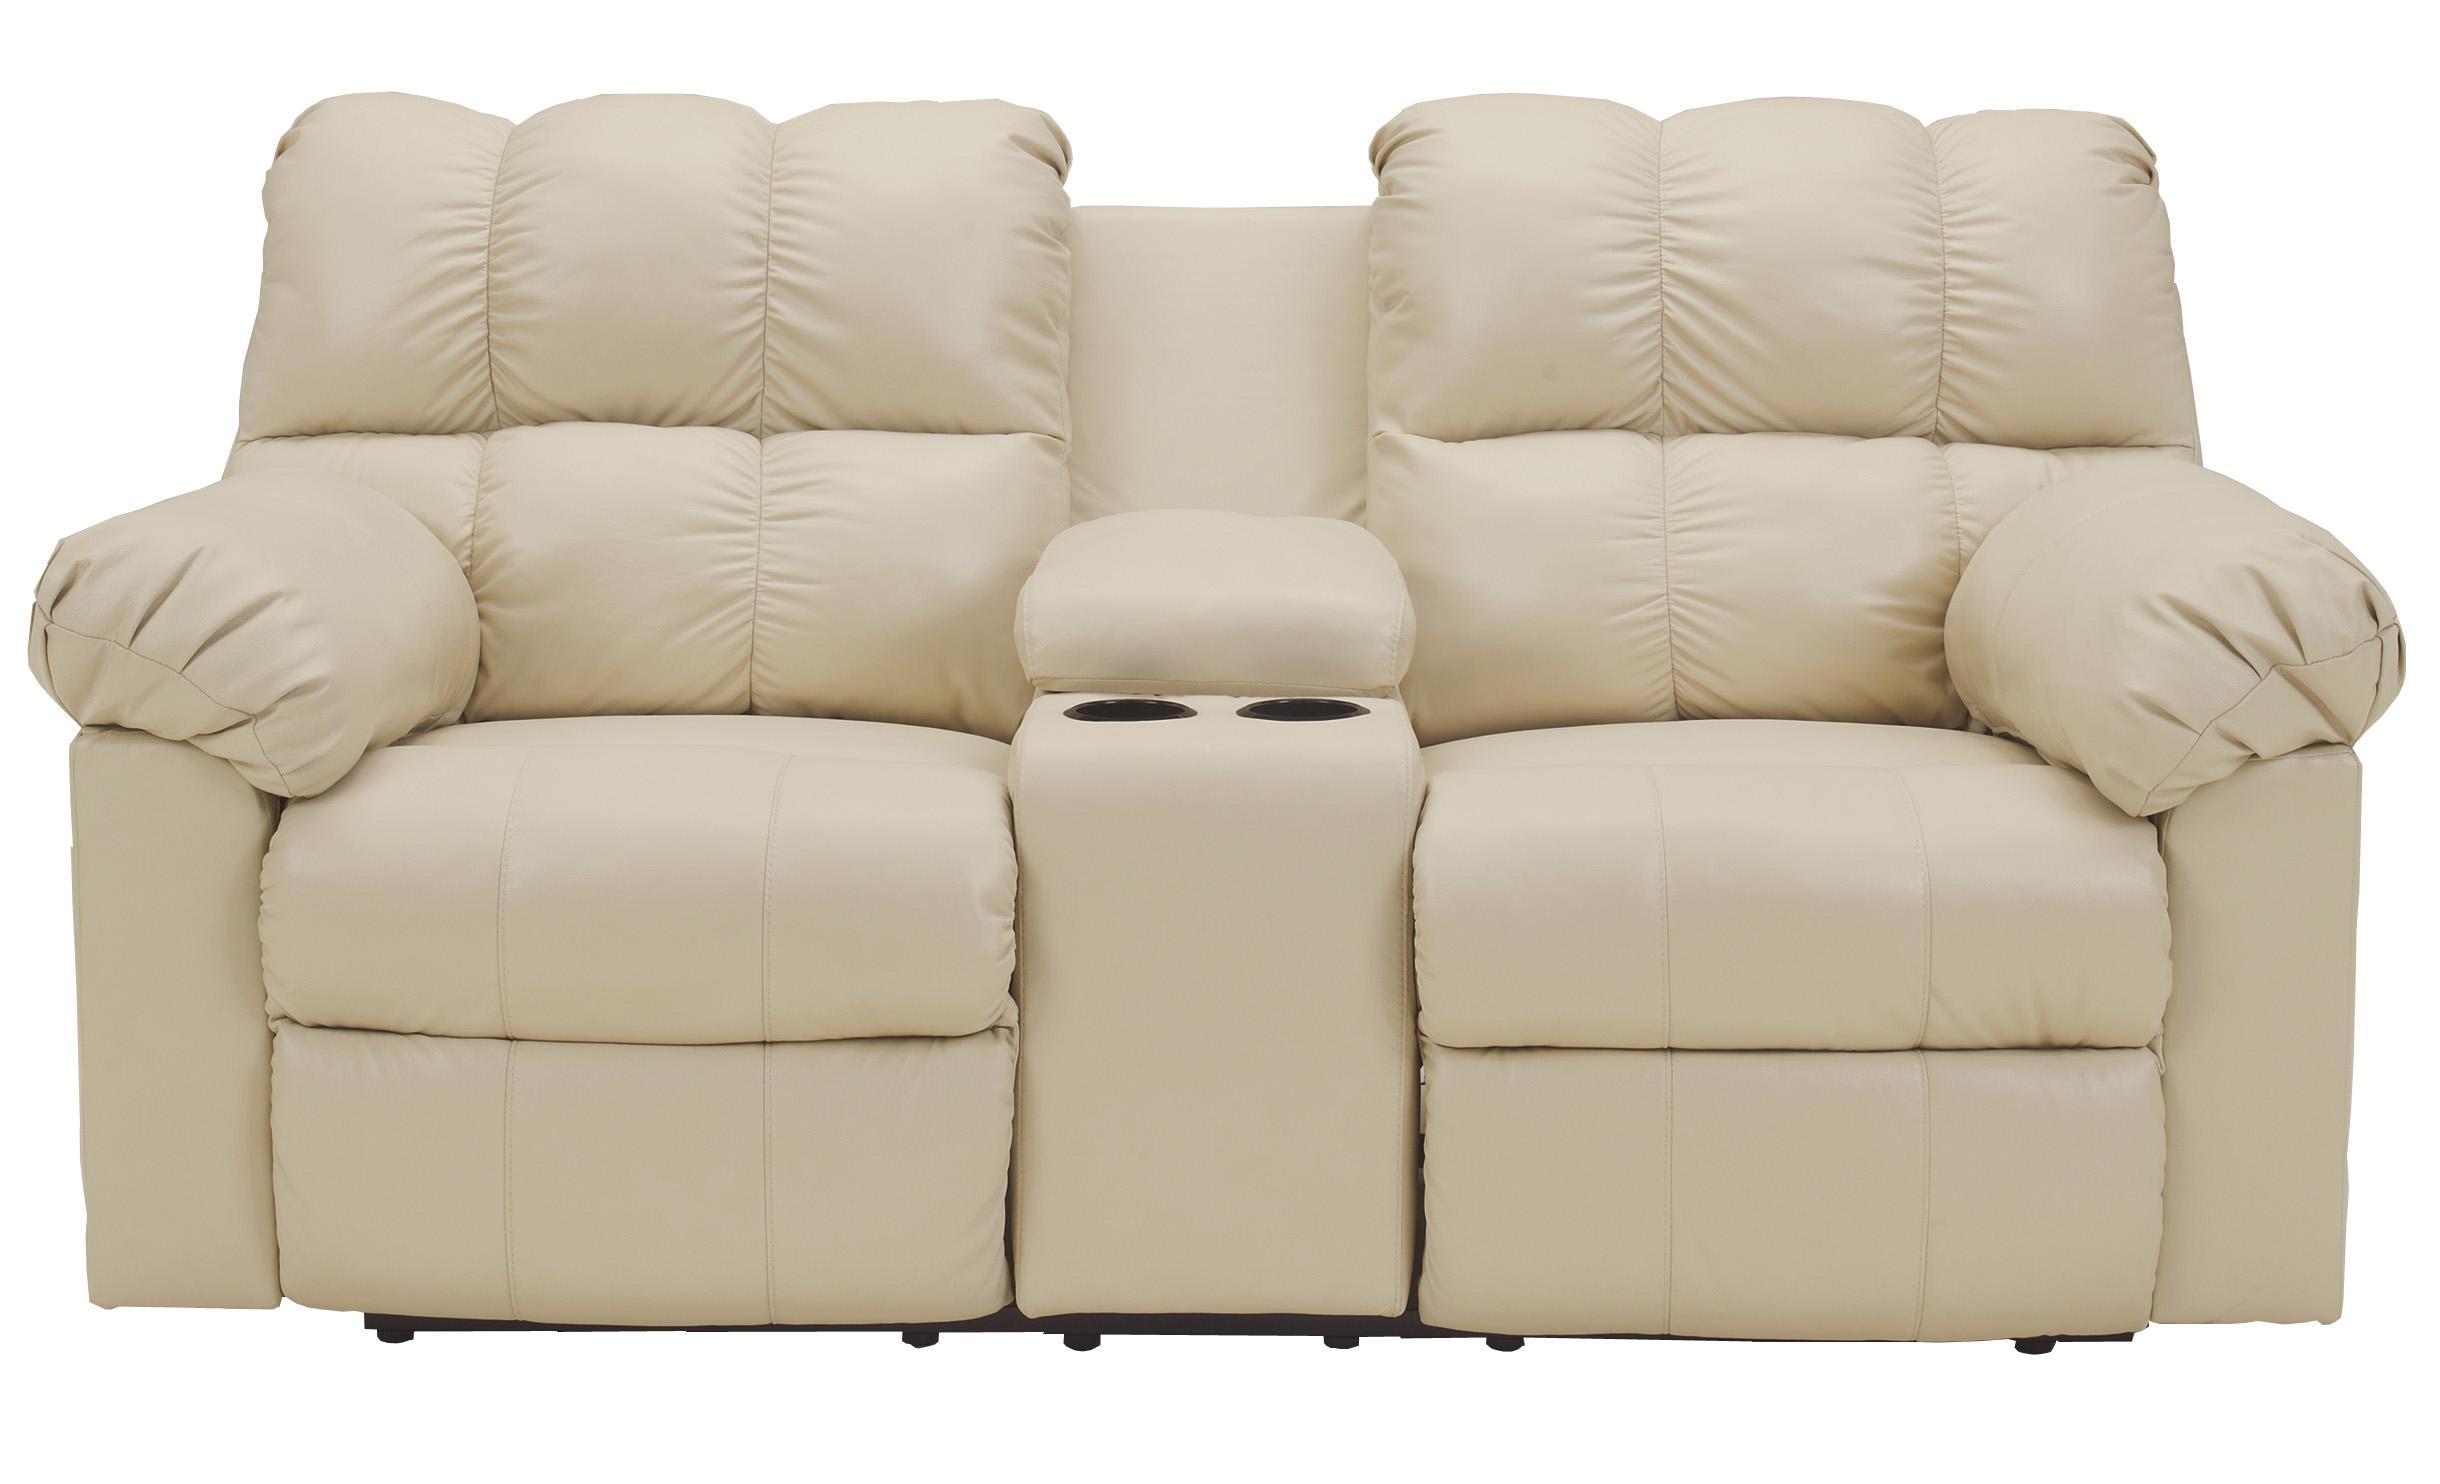 Signature Design by Ashley Kennard - Cream Dbl Rec Love Seat w/Console - Item Number: 2900294